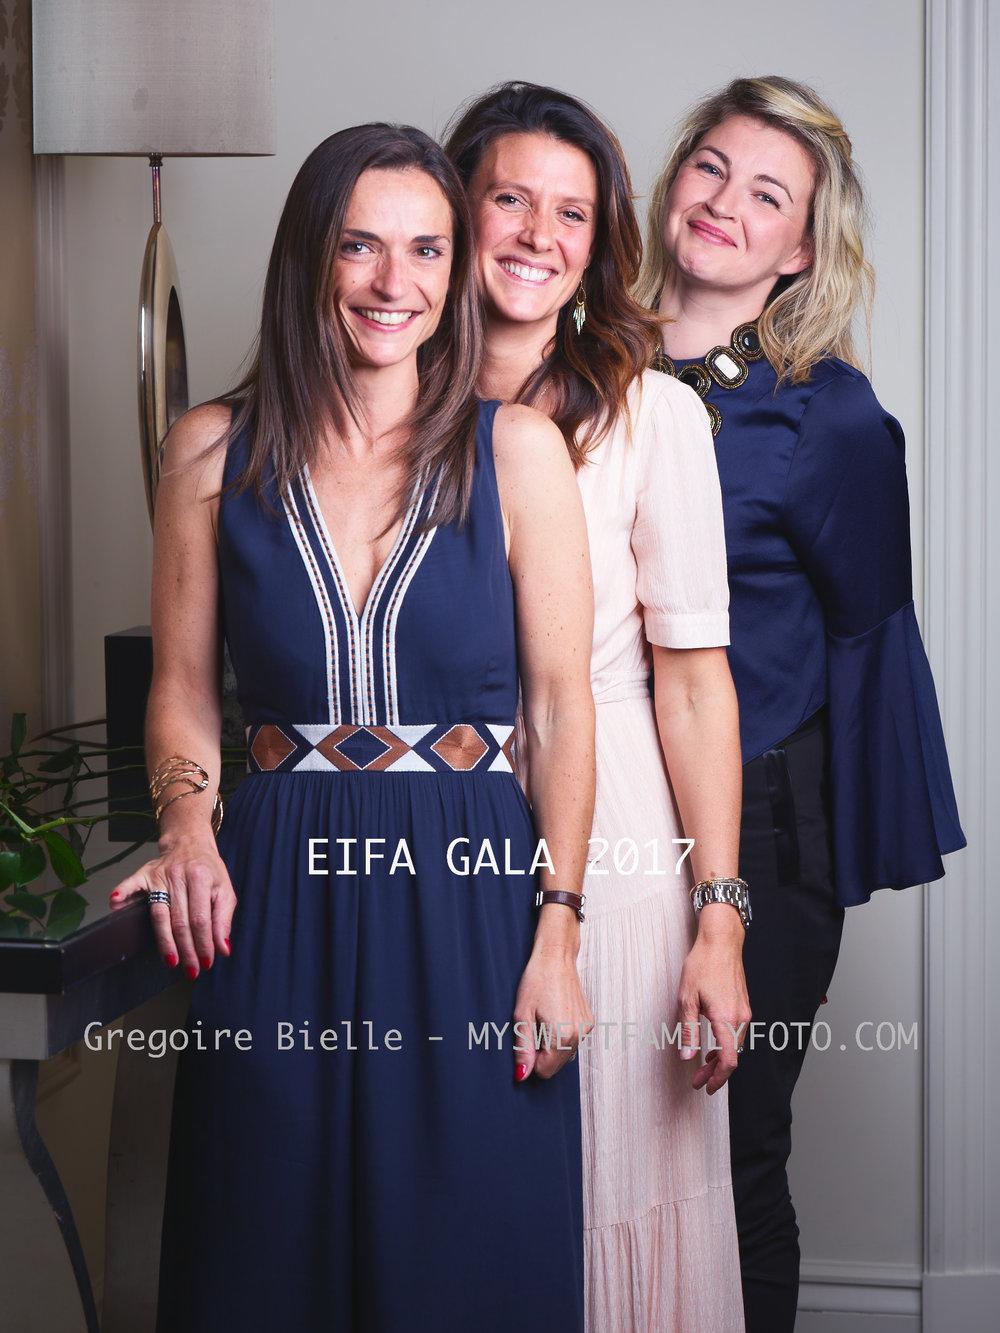 EIFA GALA 1382.jpg